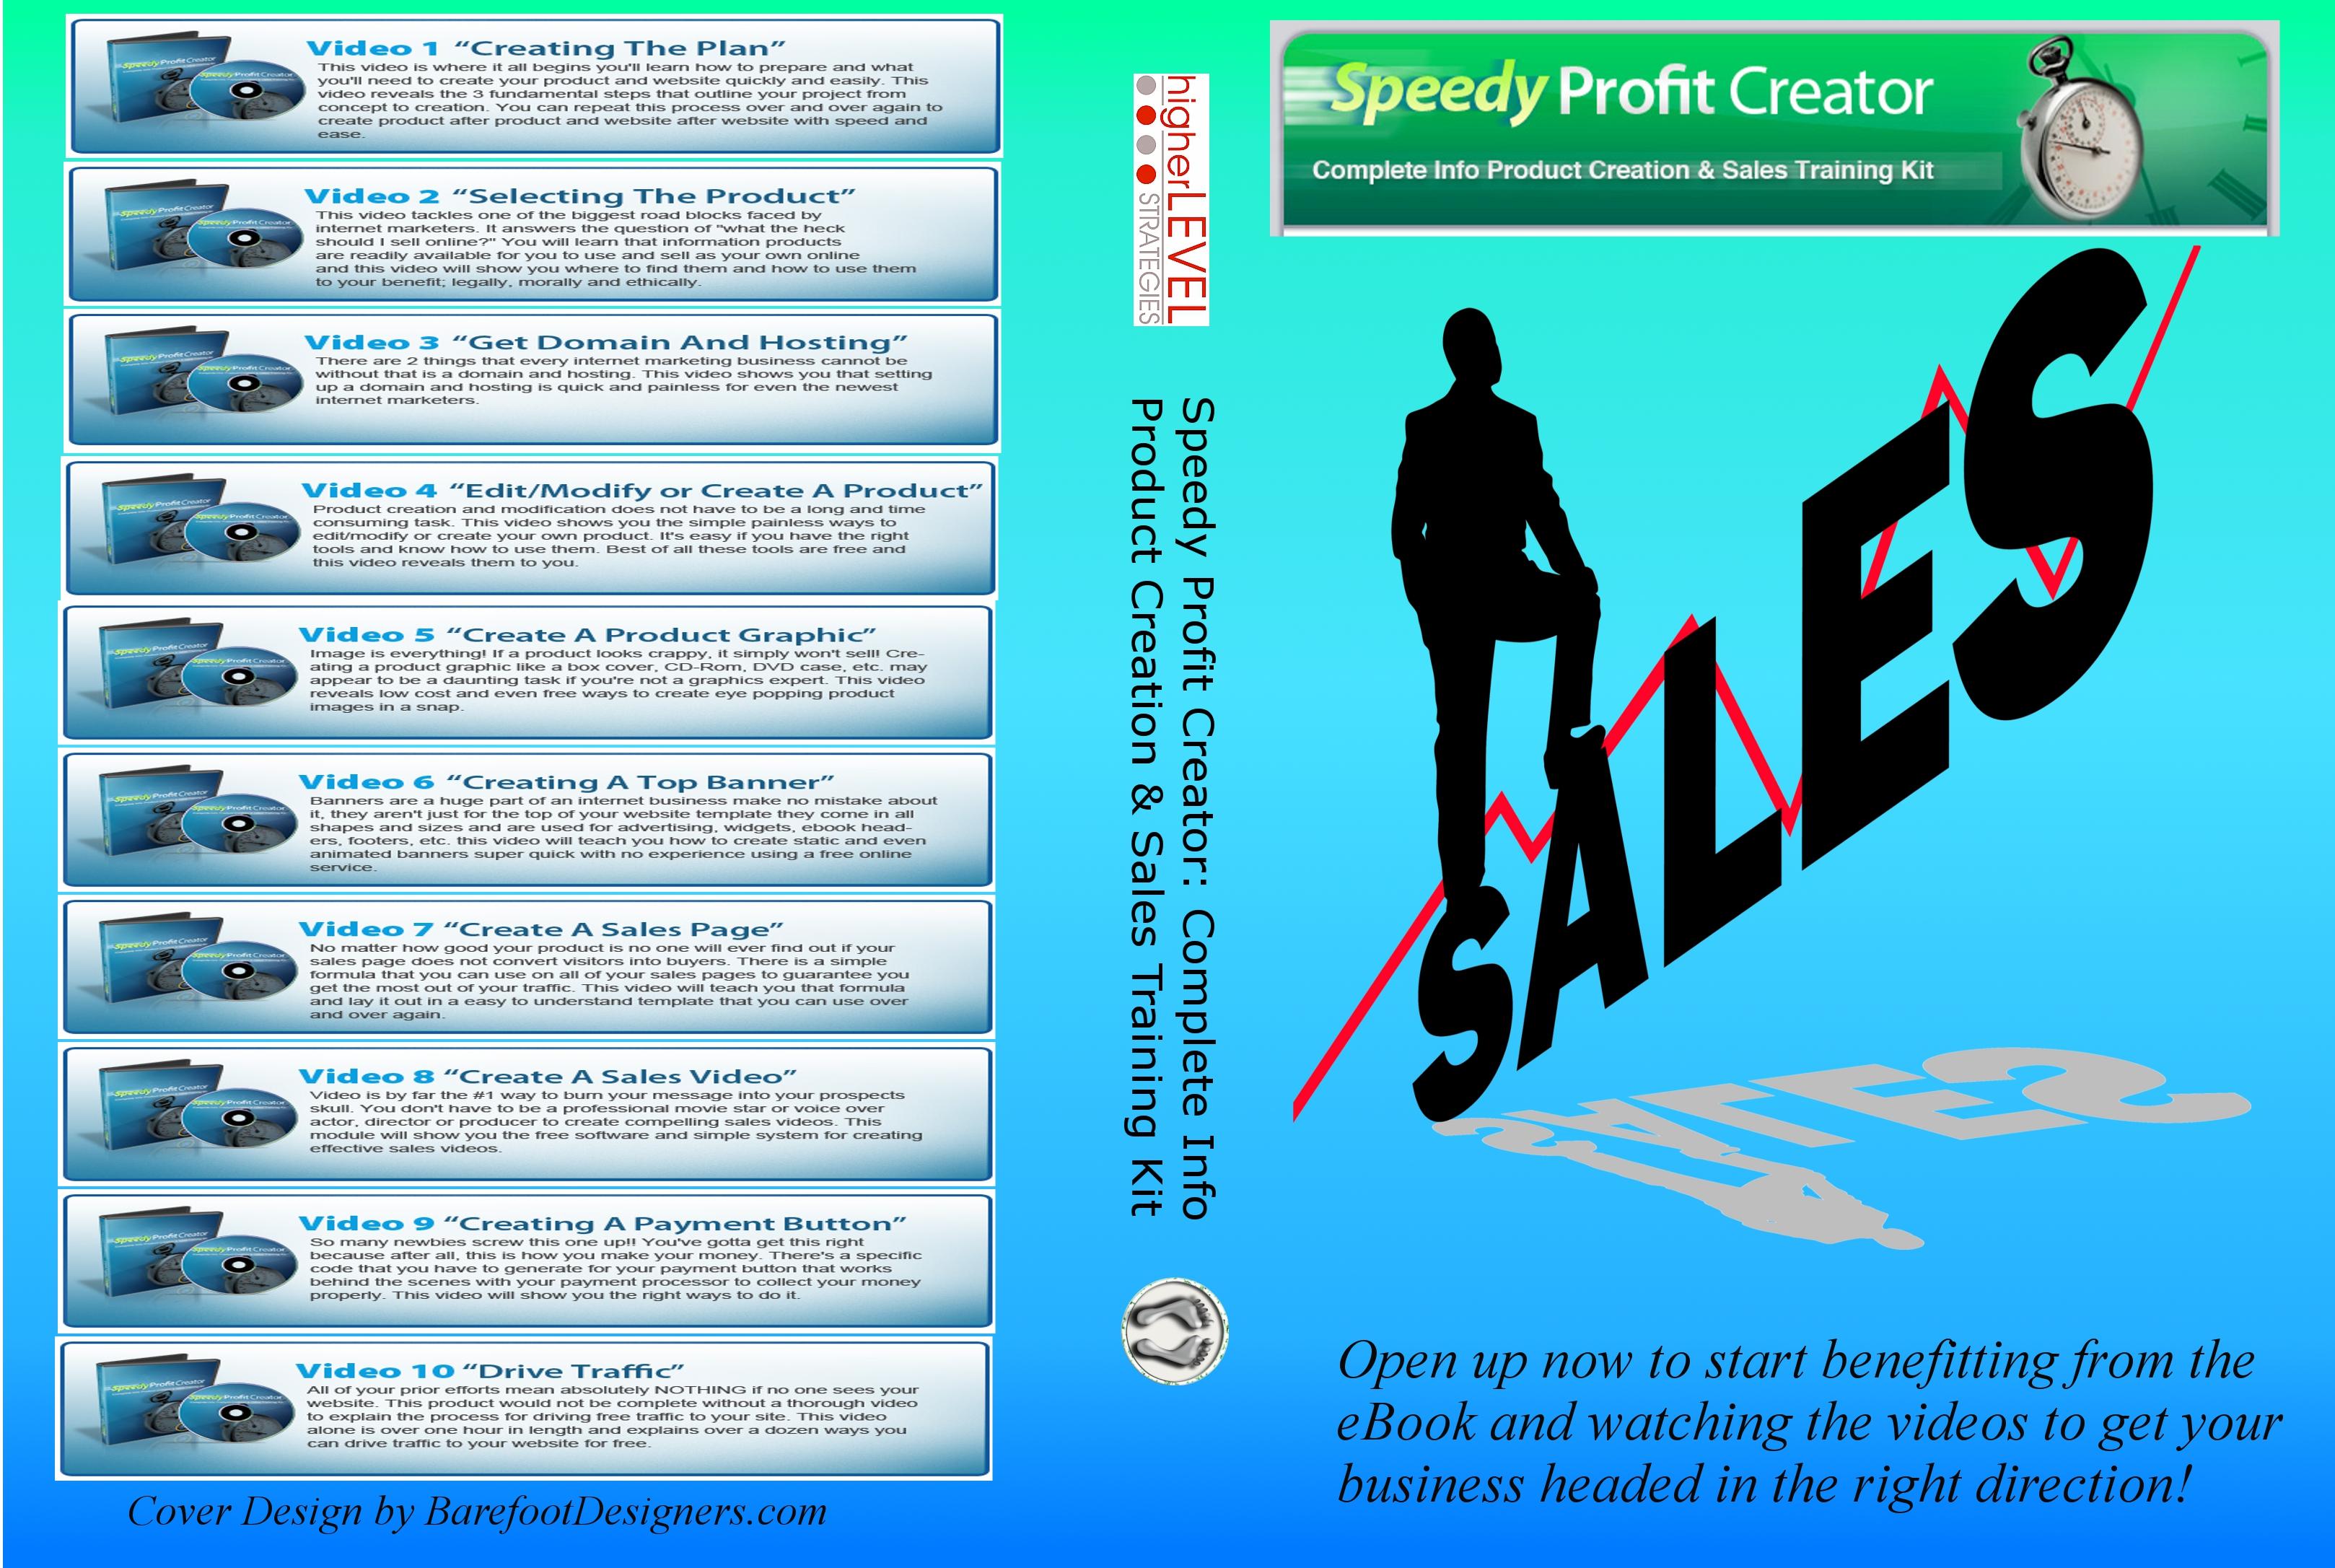 Speedy Profit Creator